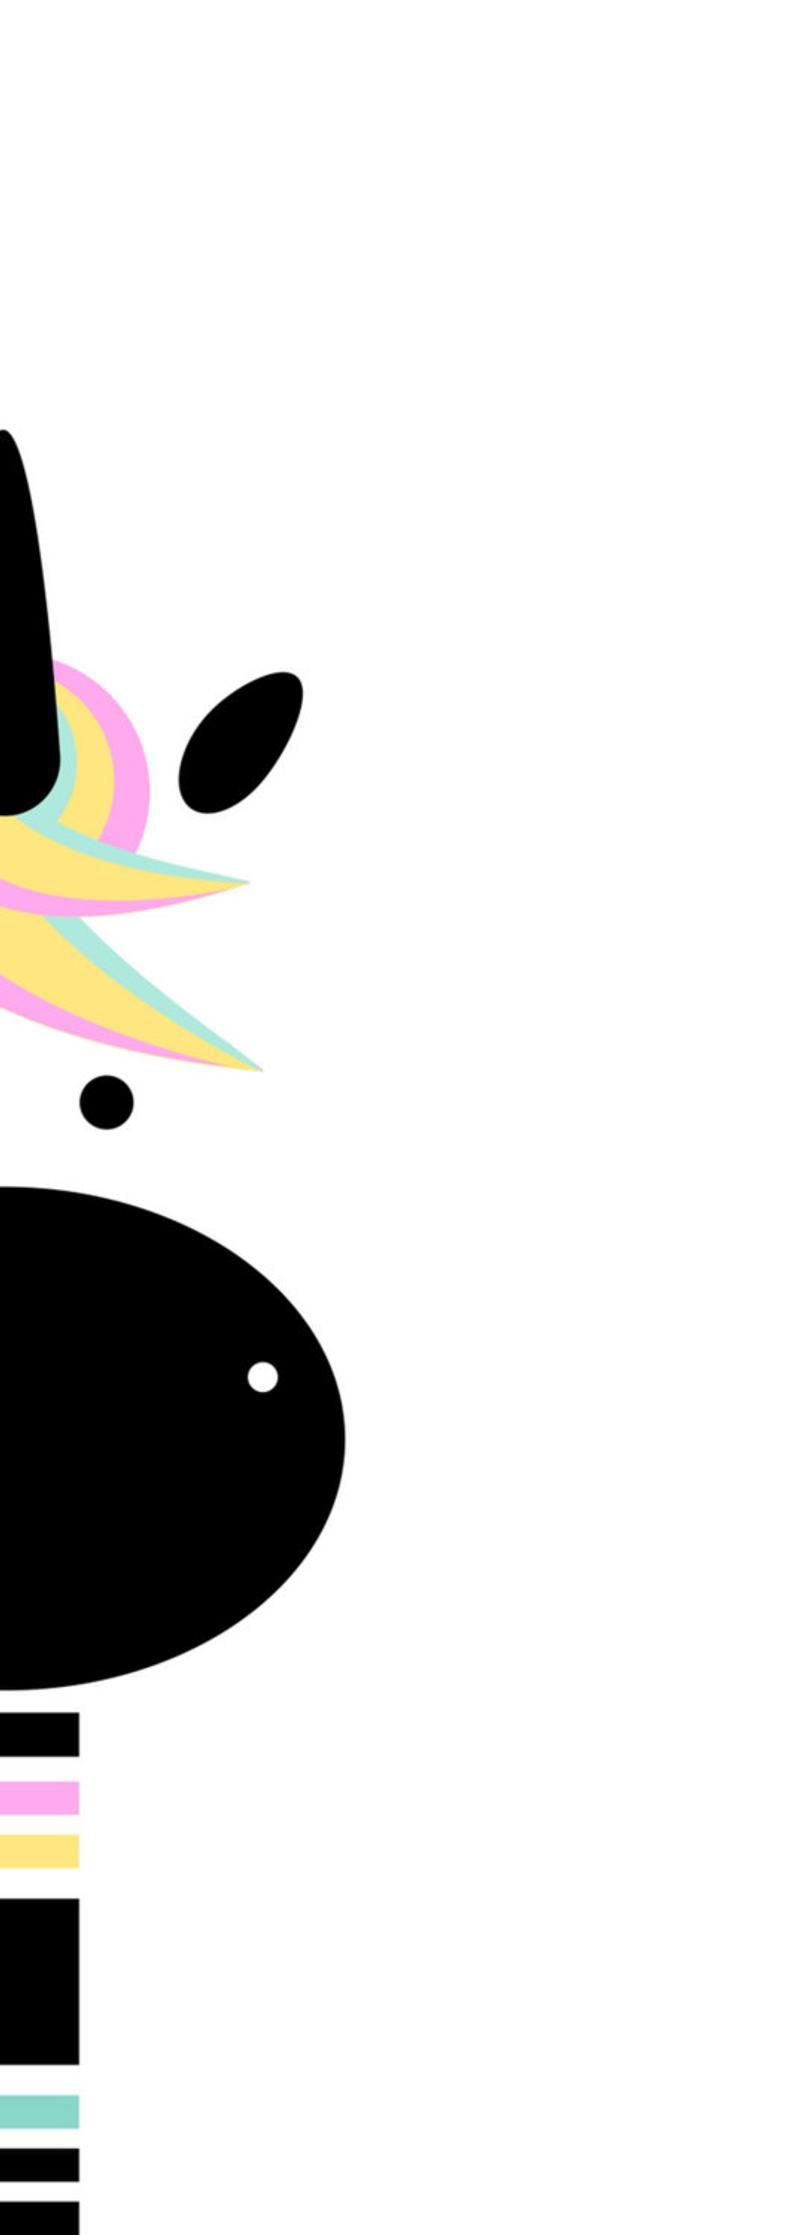 Unicorn Nursery Print, Girl Nursery Decor, Instant Download, Printable Nursery Art, Digital Download Kids Print, Girls Room Art, Unicorn Art